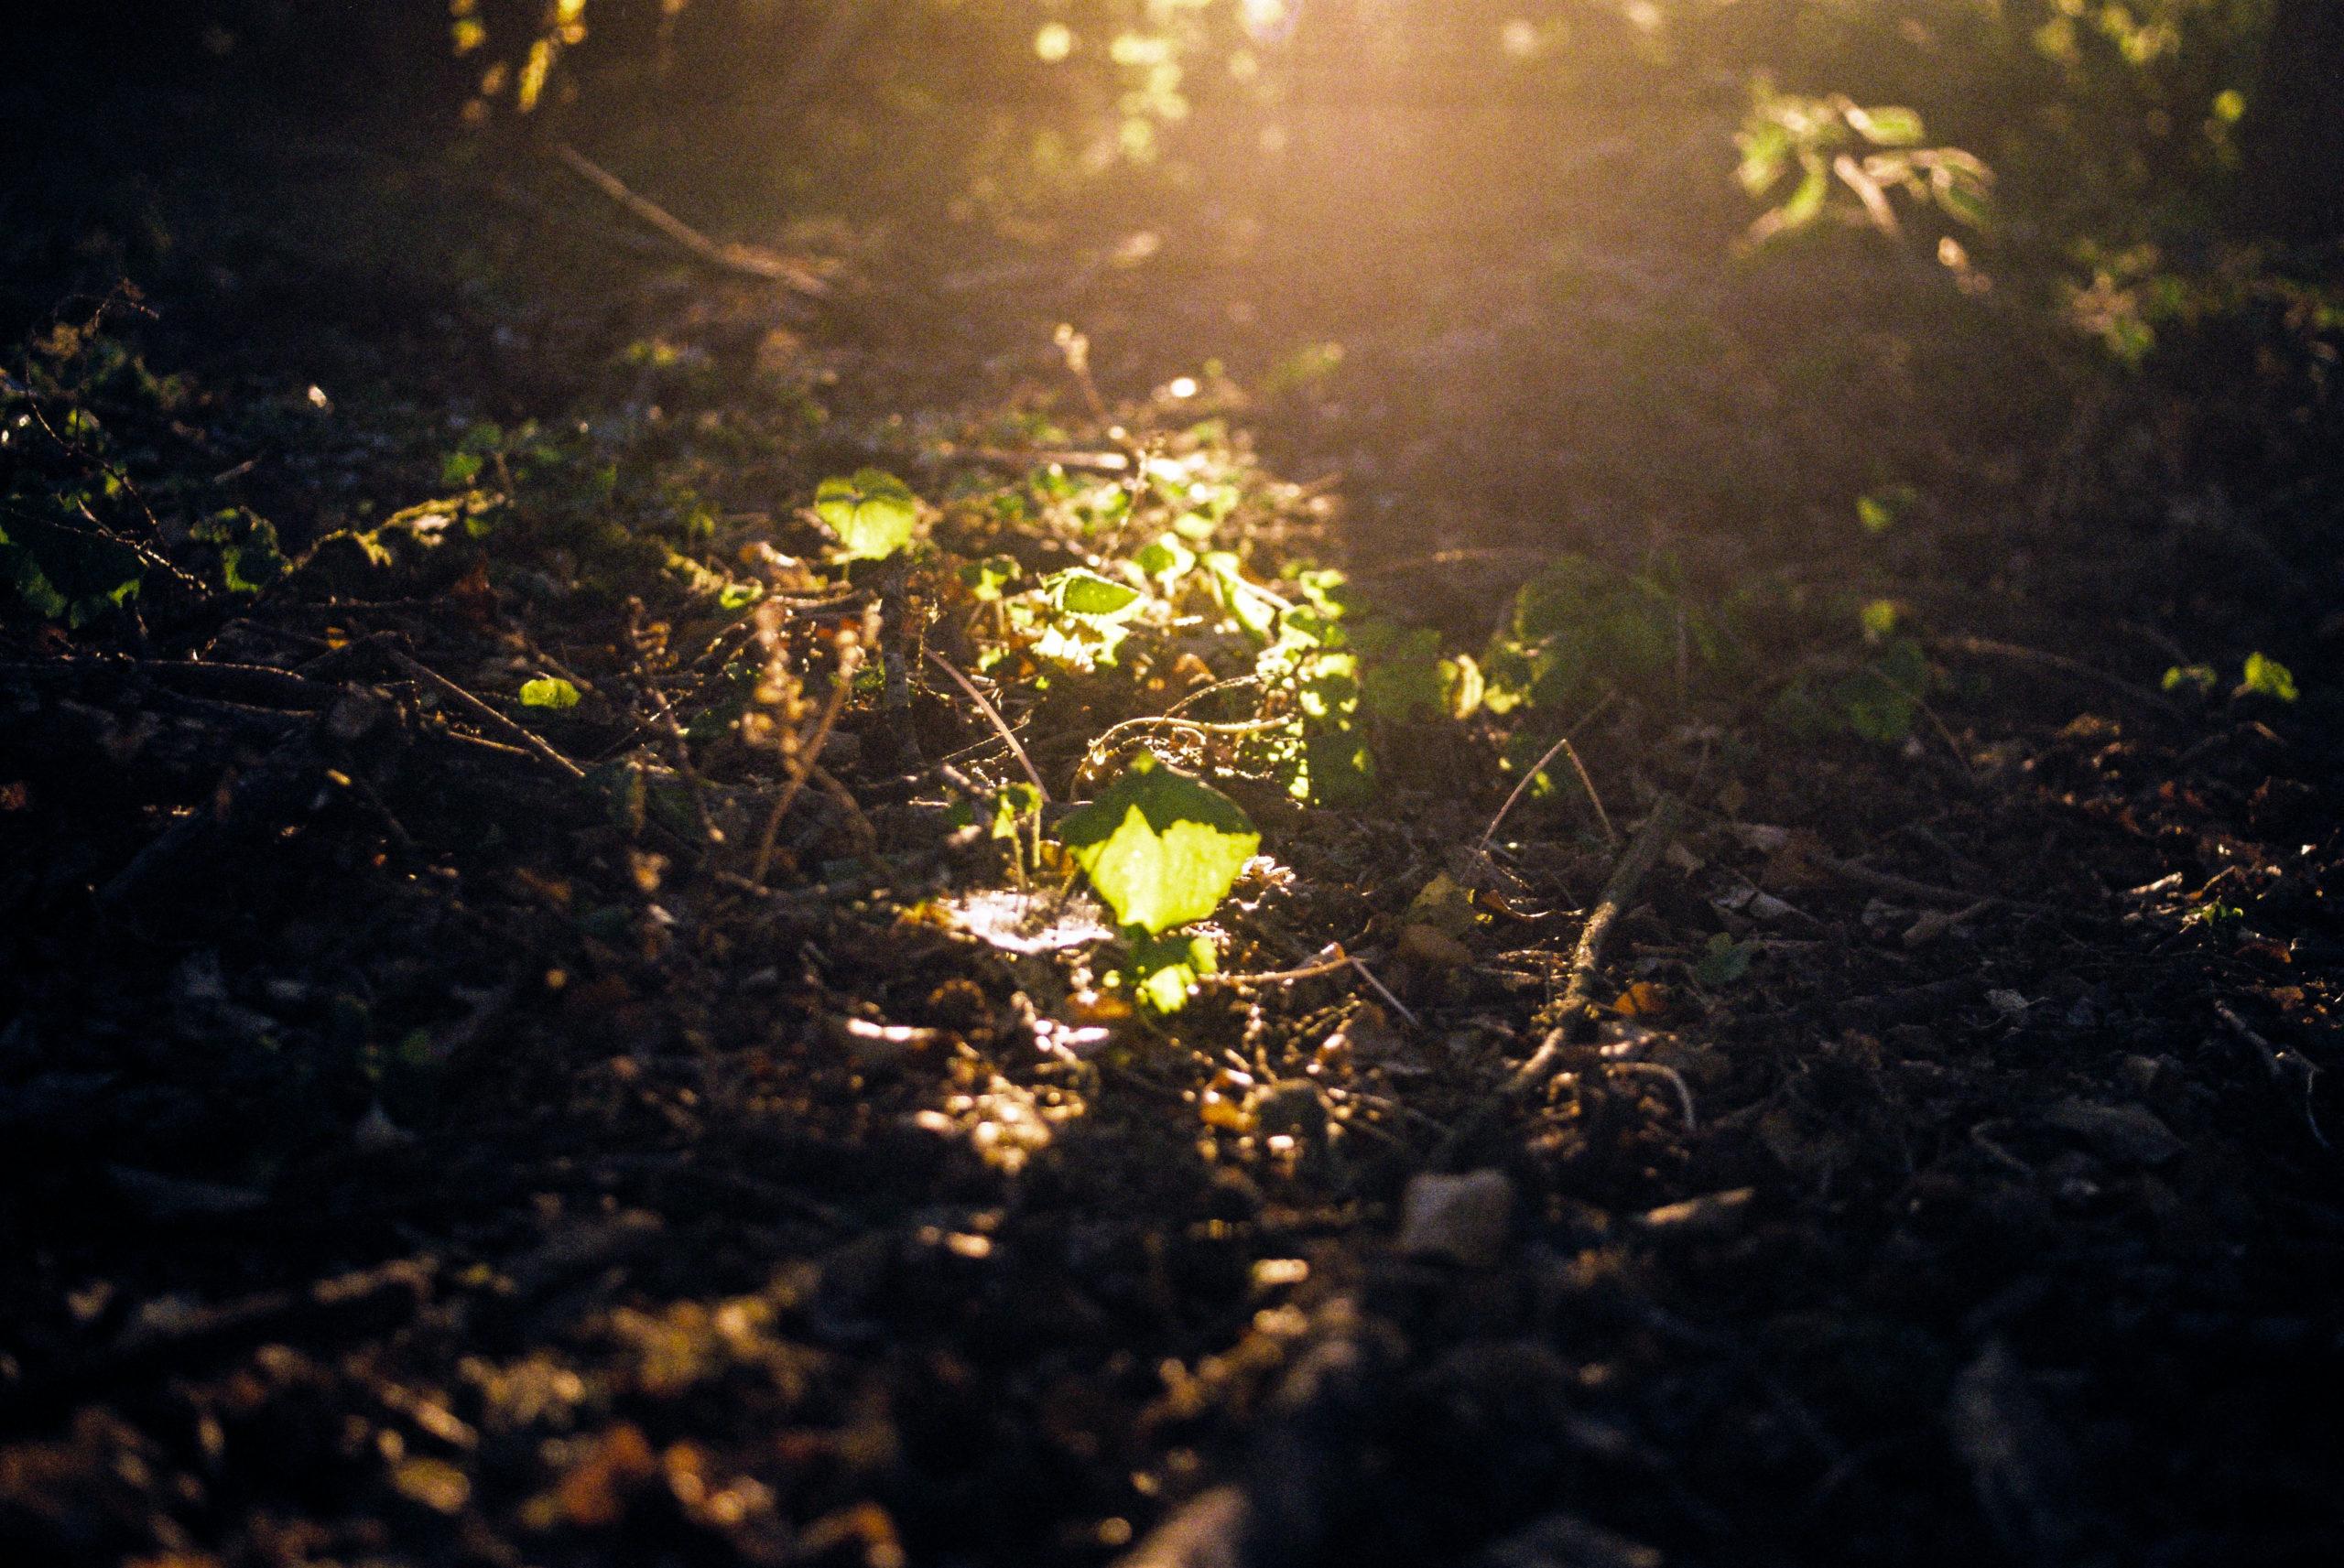 sunlight-on-the-forest-floor-P9DPT9N